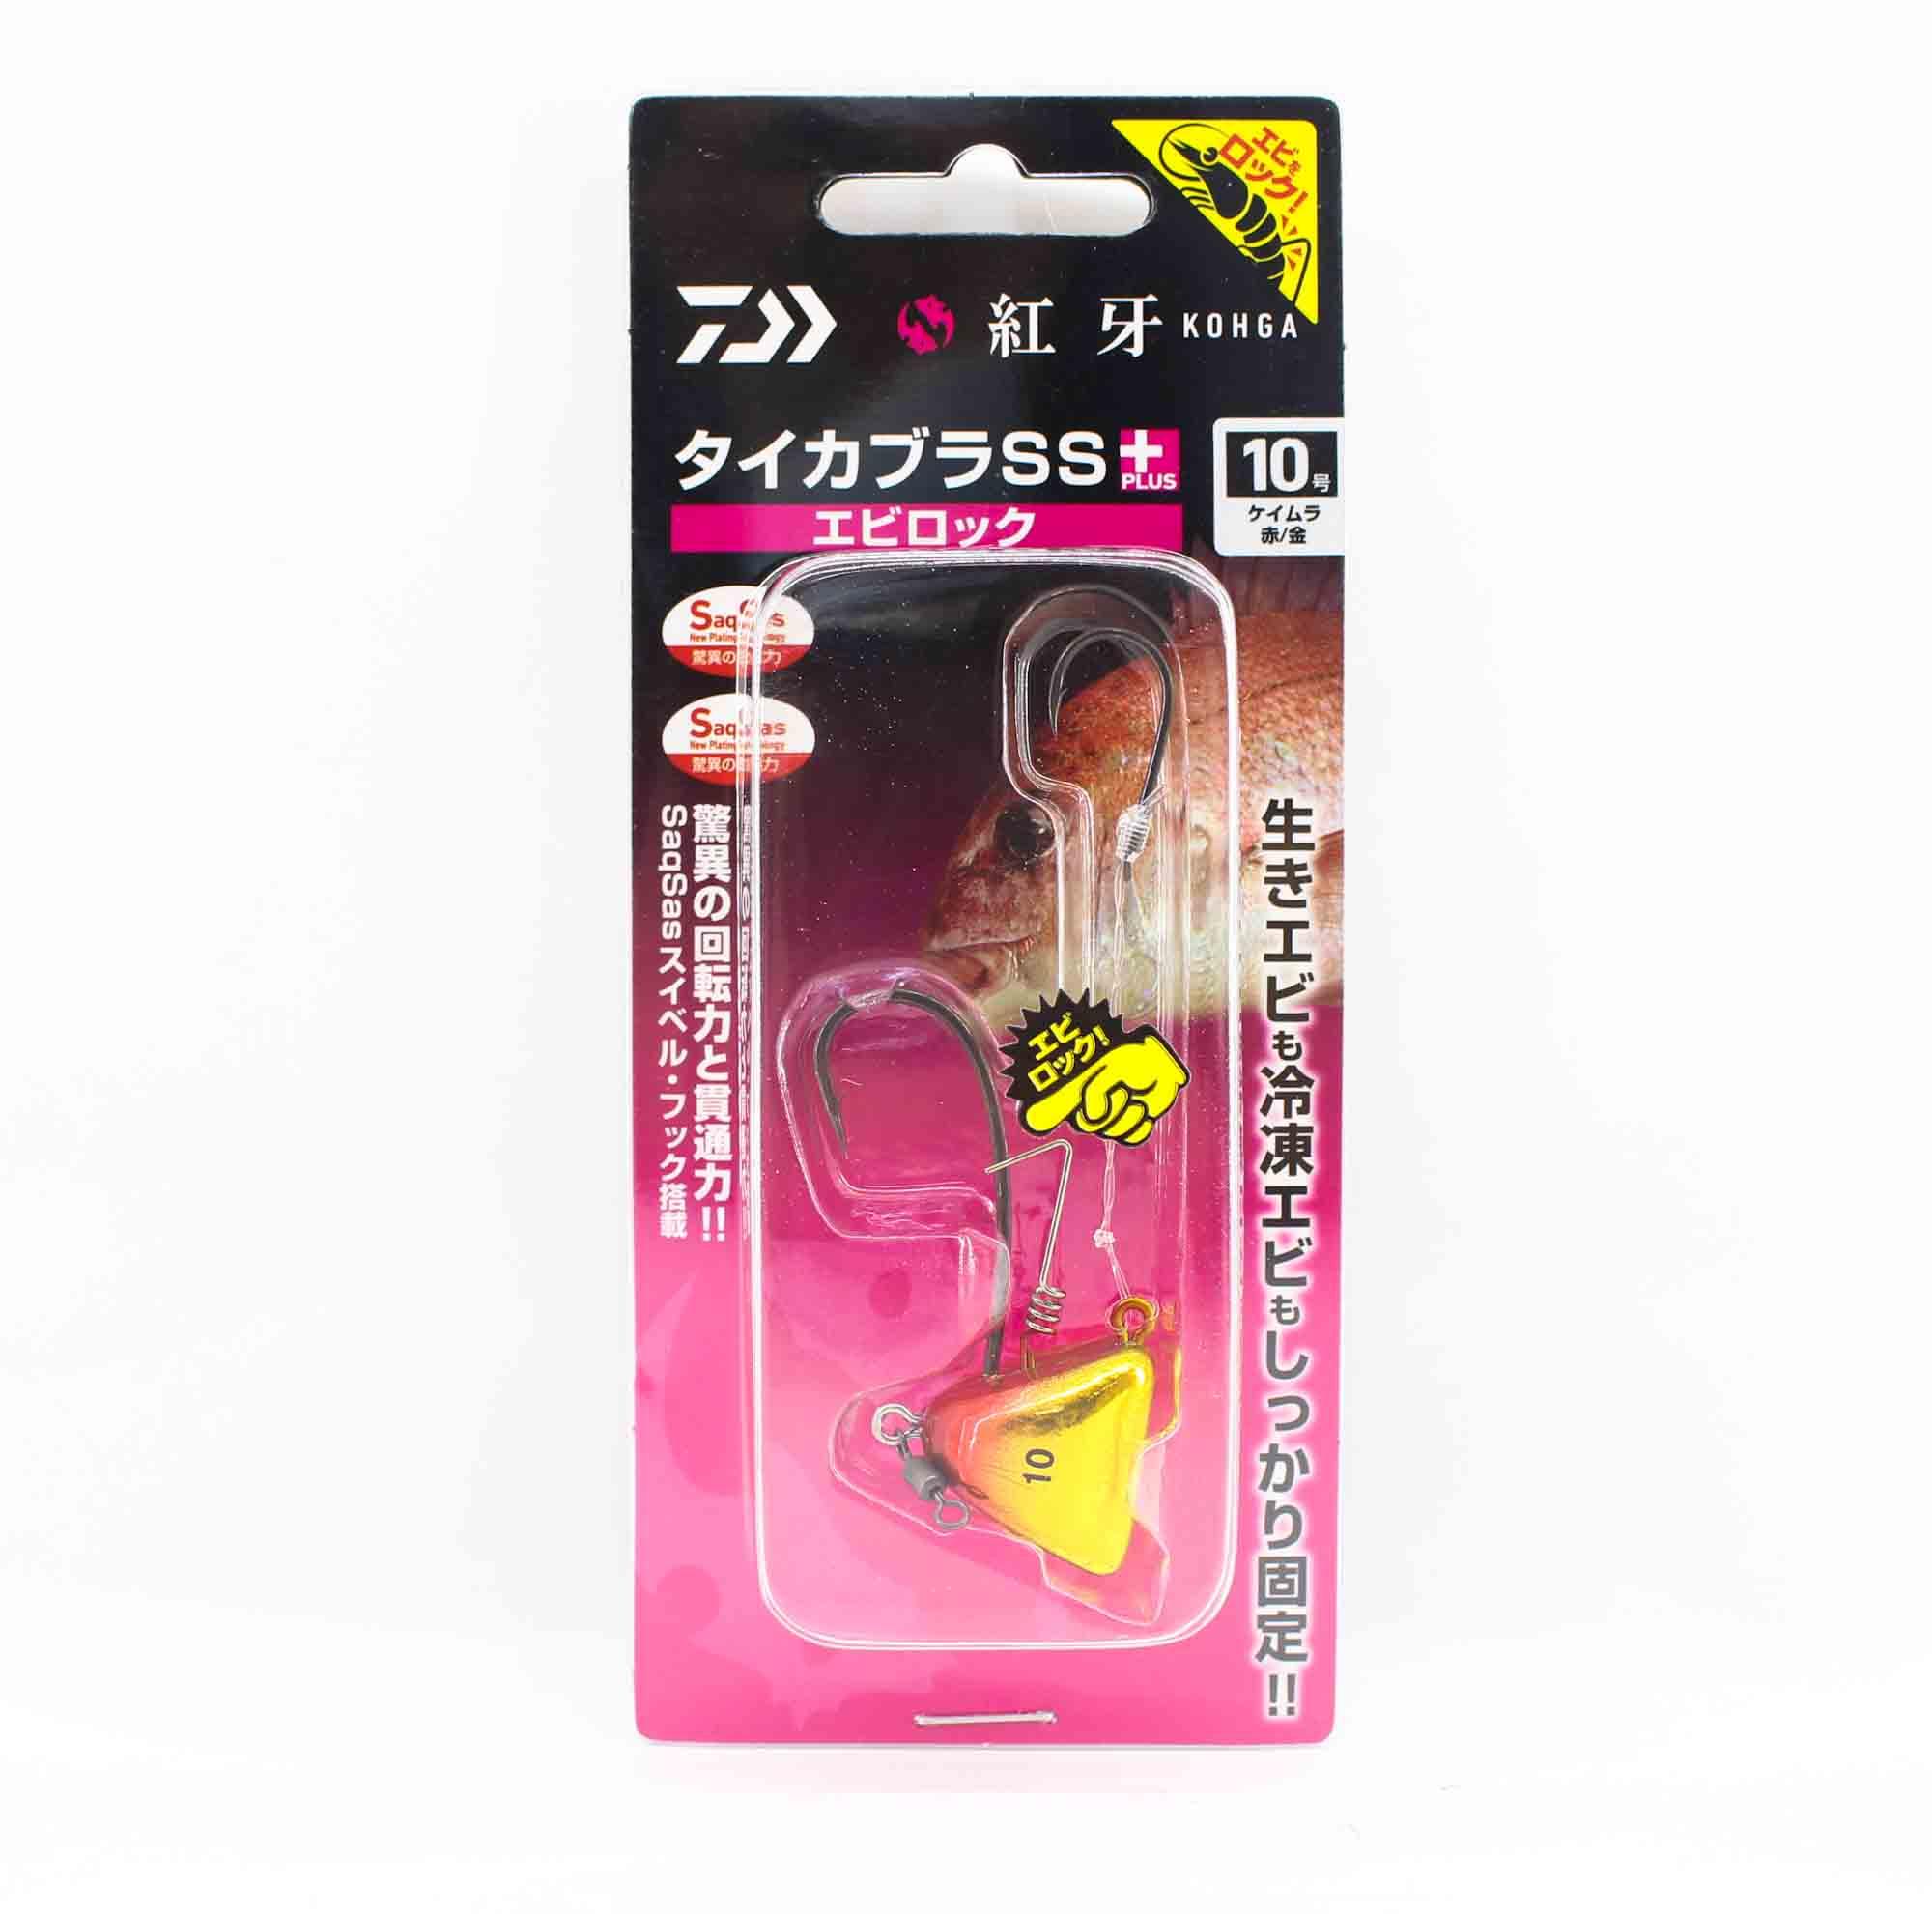 Daiwa Kabura SS+ Tenya Jig Size 10 UV Red/Gold 003189